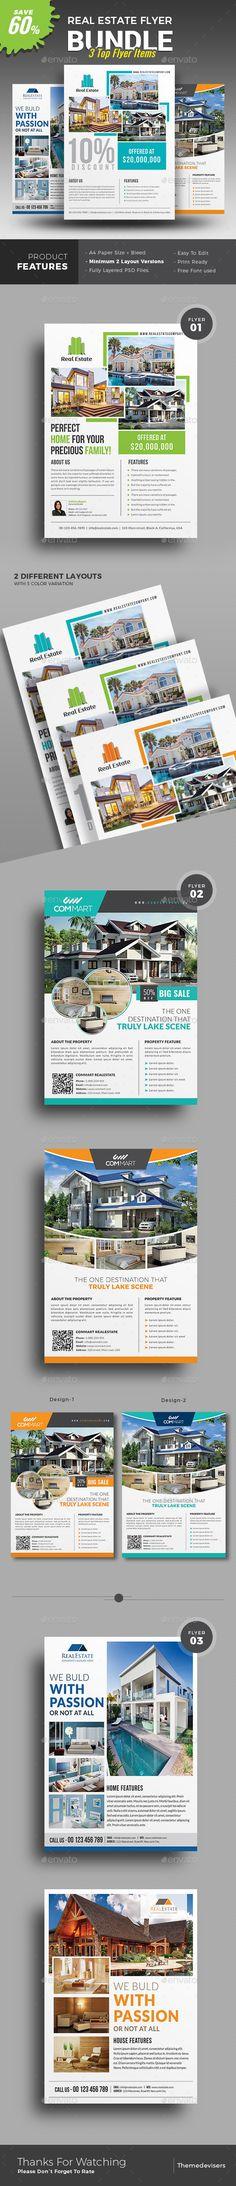 #Real #Estate #Flyer - Commerce Flyers Download here:  https://graphicriver.net/item/real-estate-flyer/19551505?ref=alena994